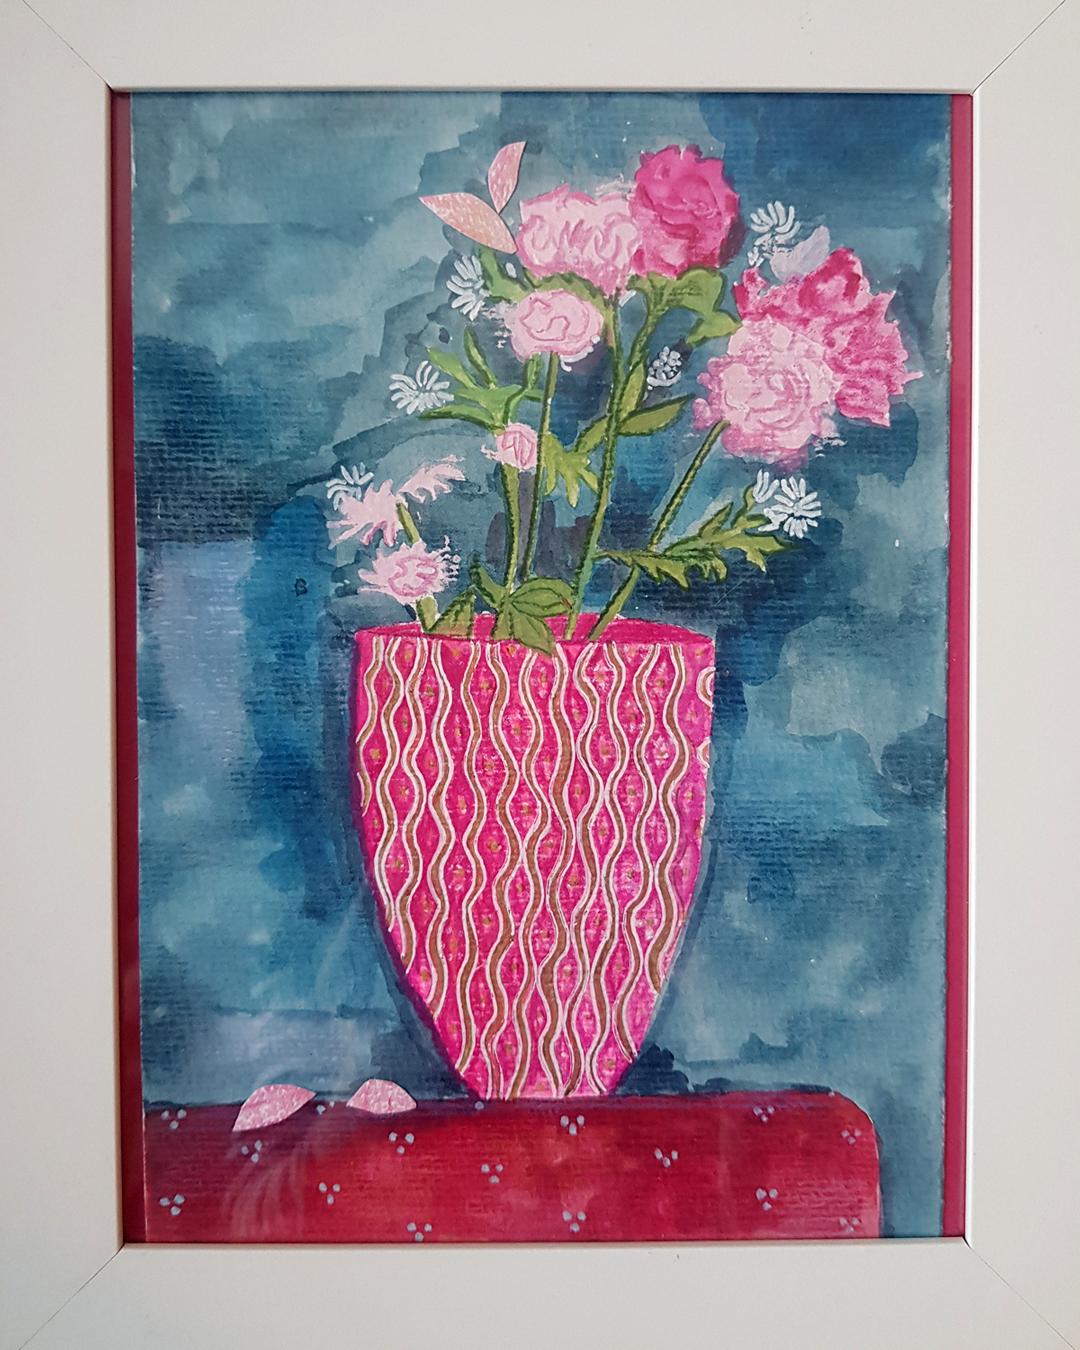 Fiona Van Brabandt - Peinture, illustration